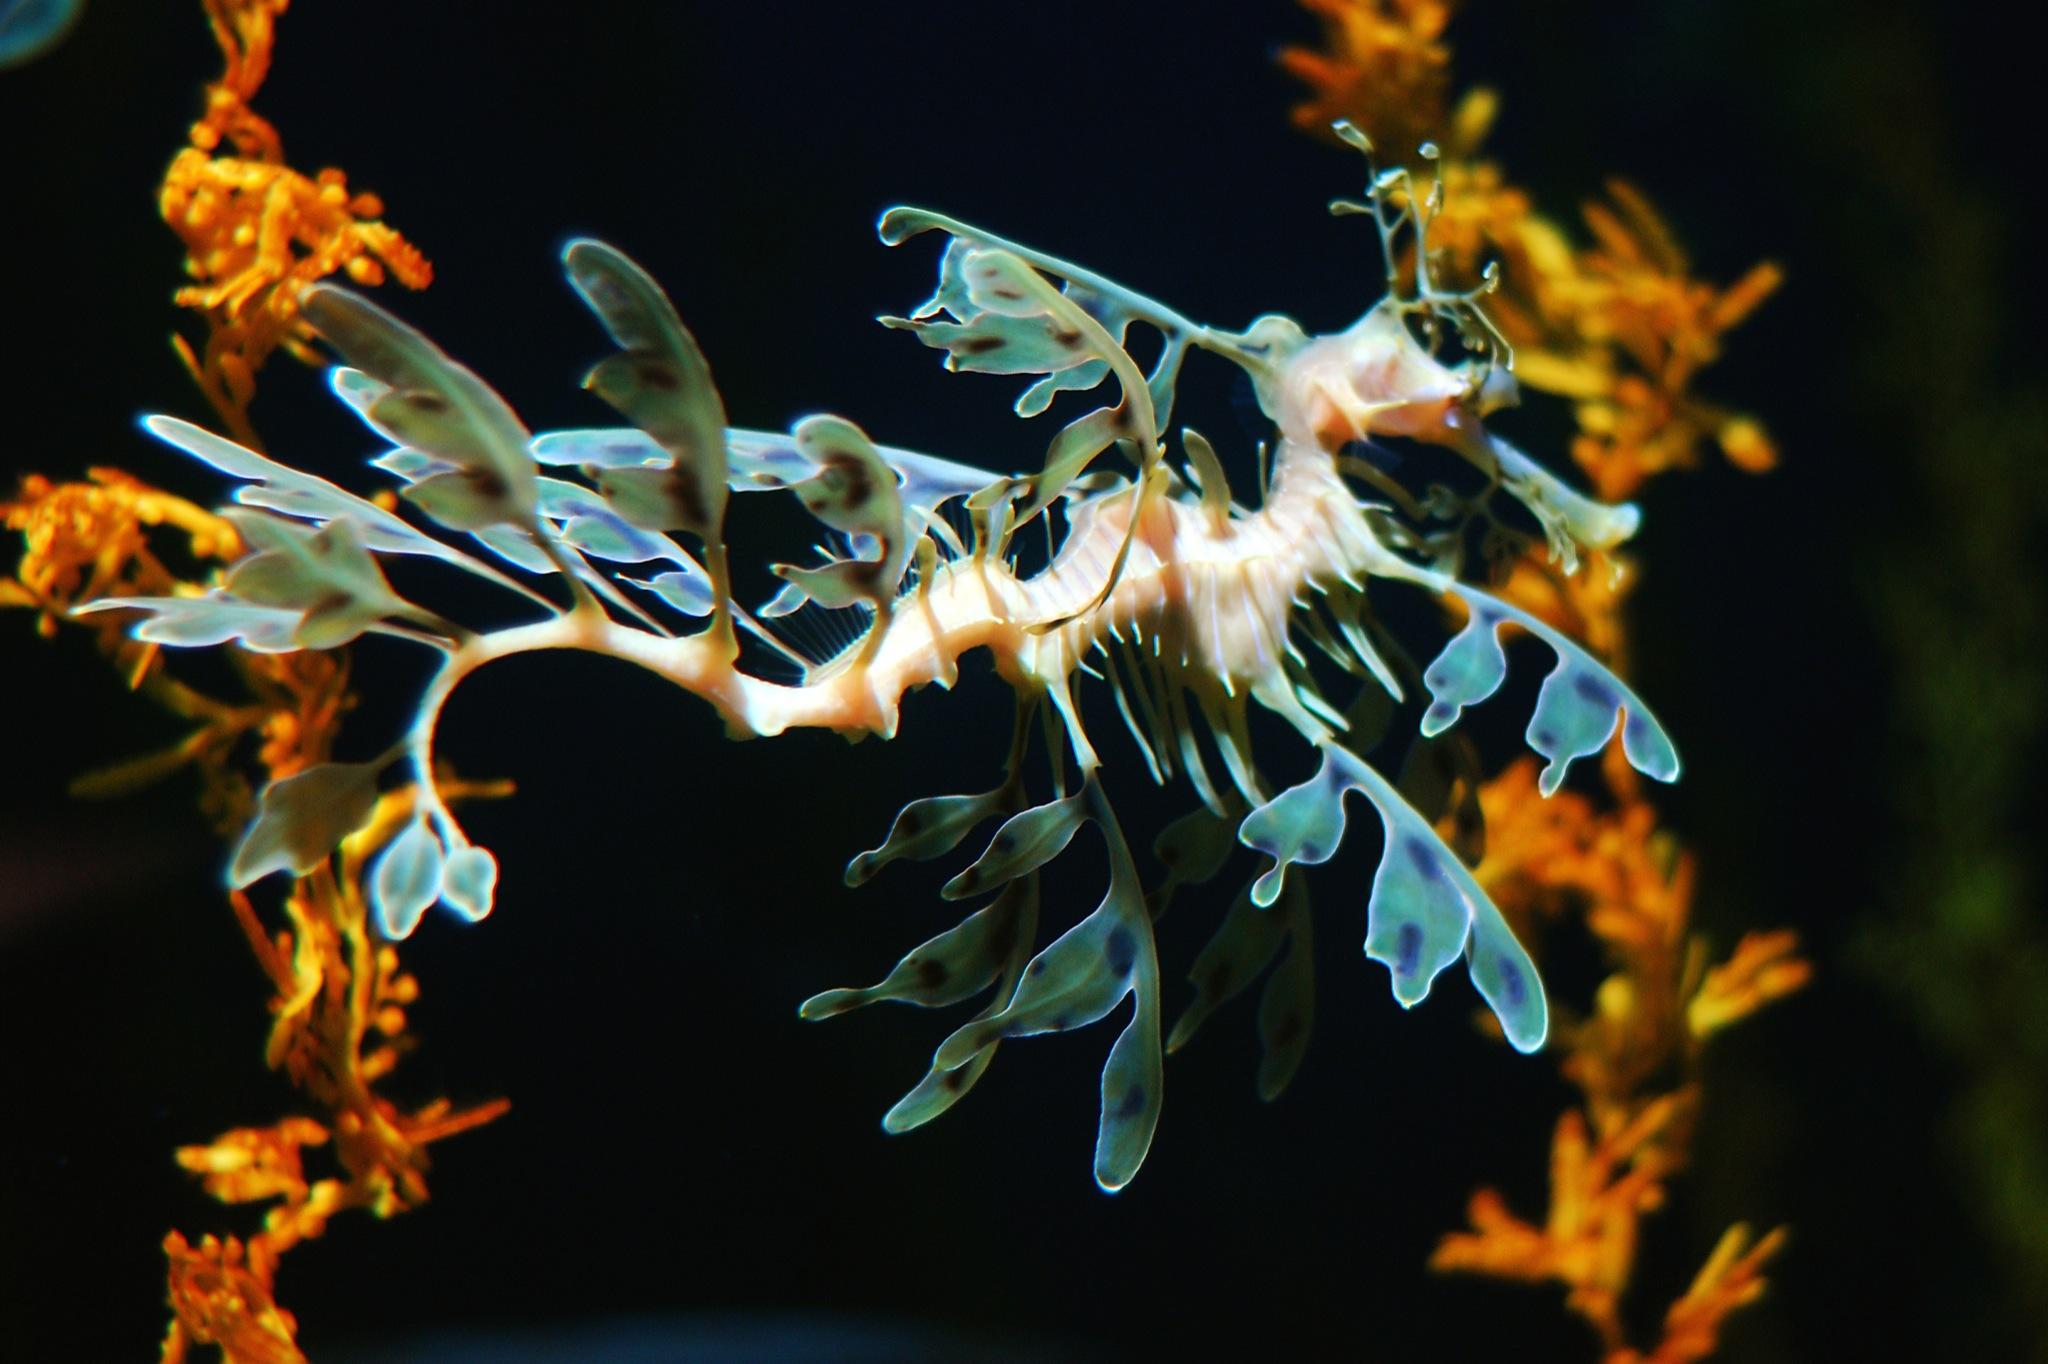 2048x1364 > Leafy Seadragon Wallpapers